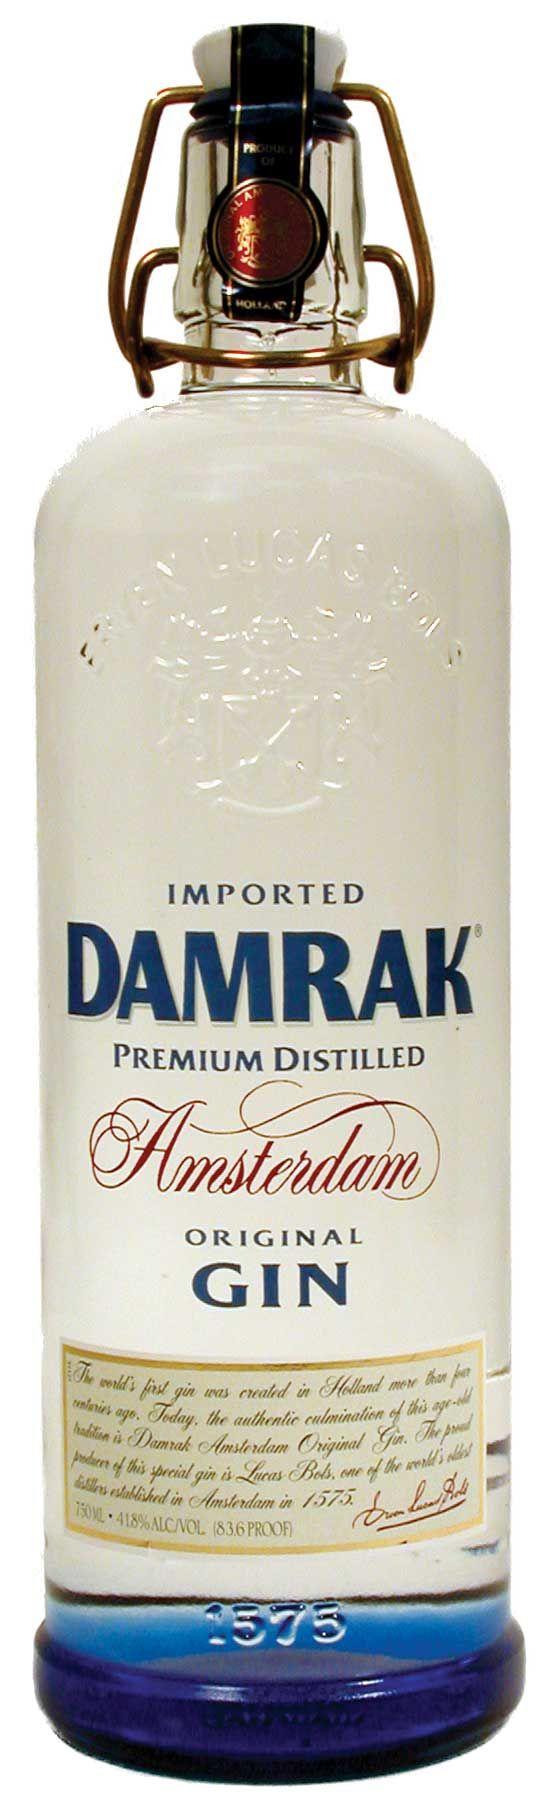 FREE Damrak Gin tasting tonight! http://www.juliosliquors.com/calendar.htm